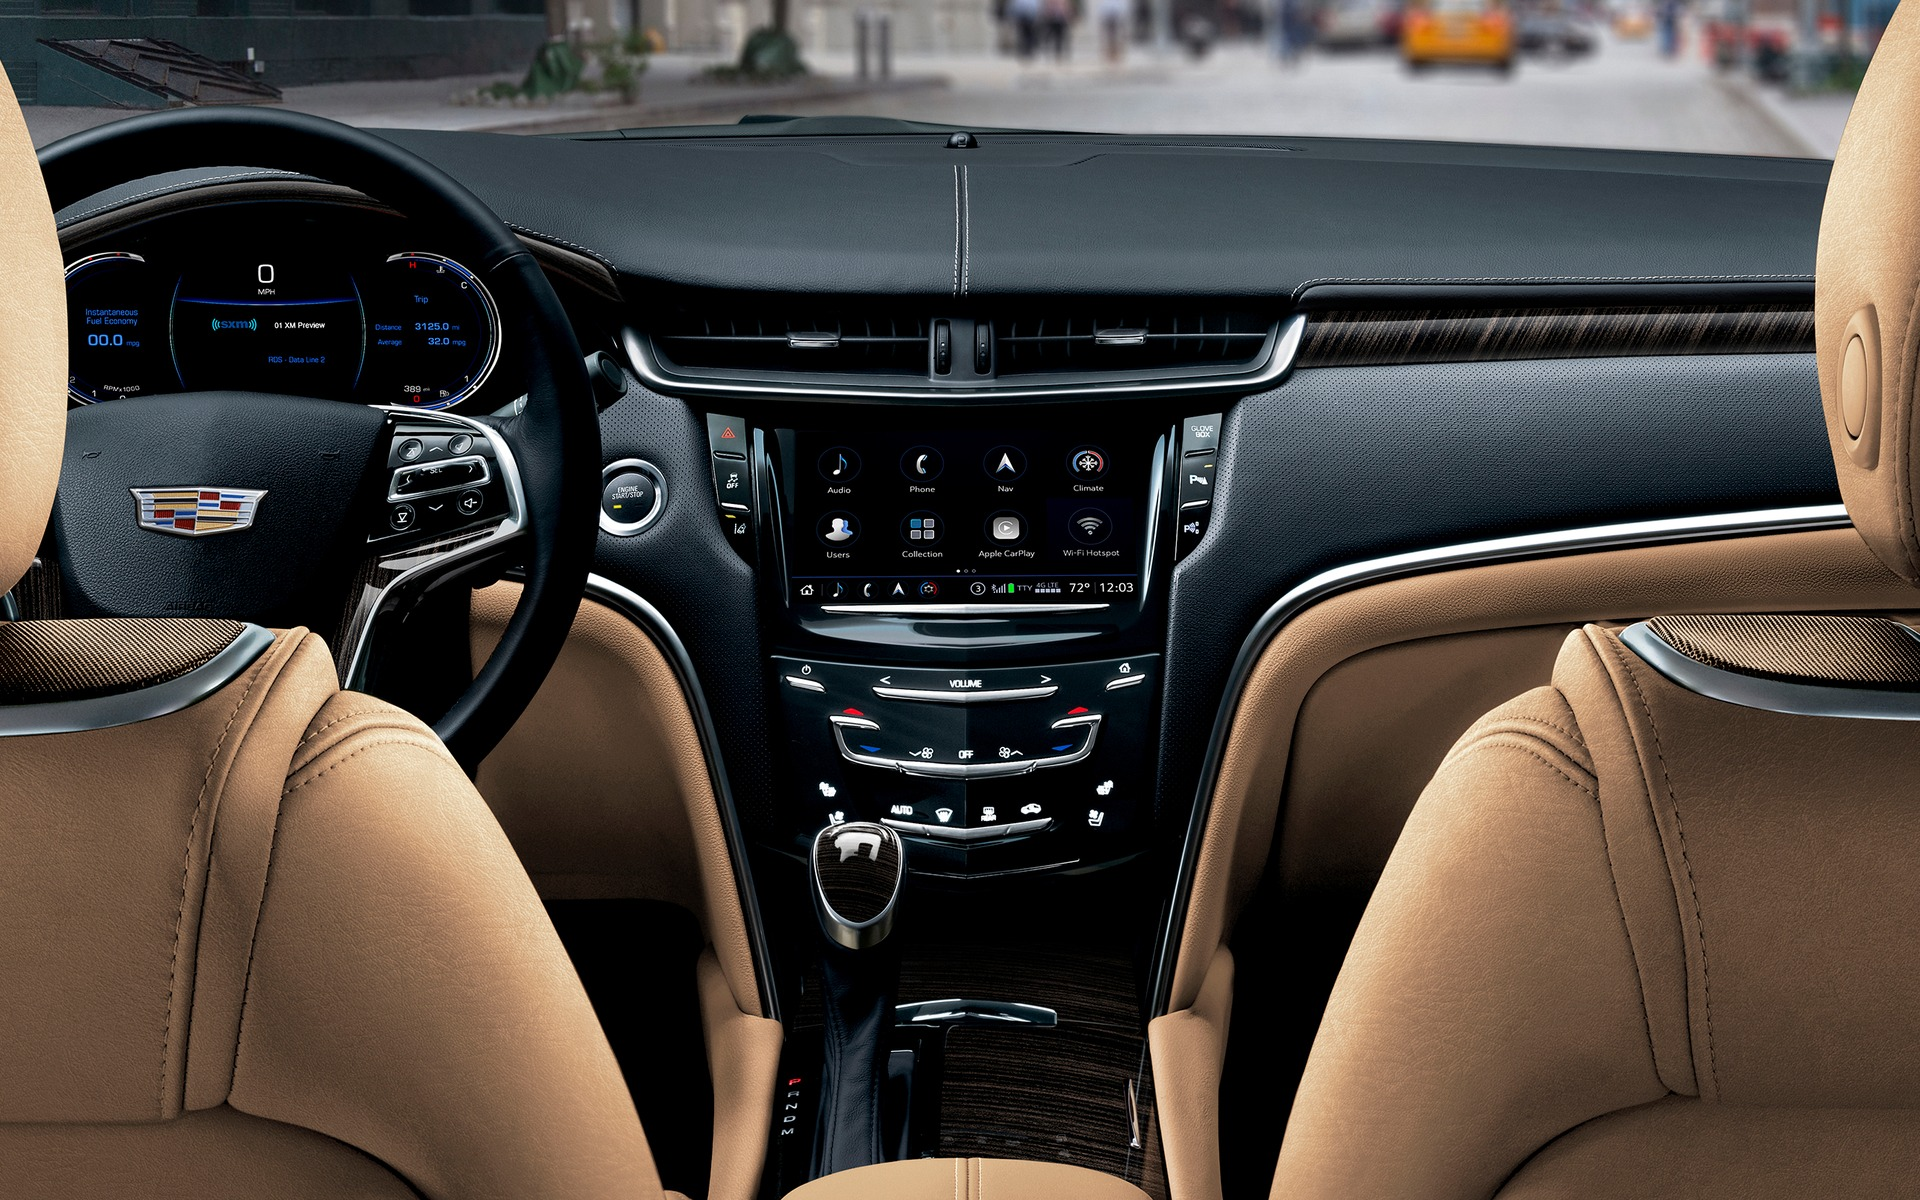 <p>Le syst&egrave;me Cadillac CUE dans la Cadillac XTS 2018.</p>